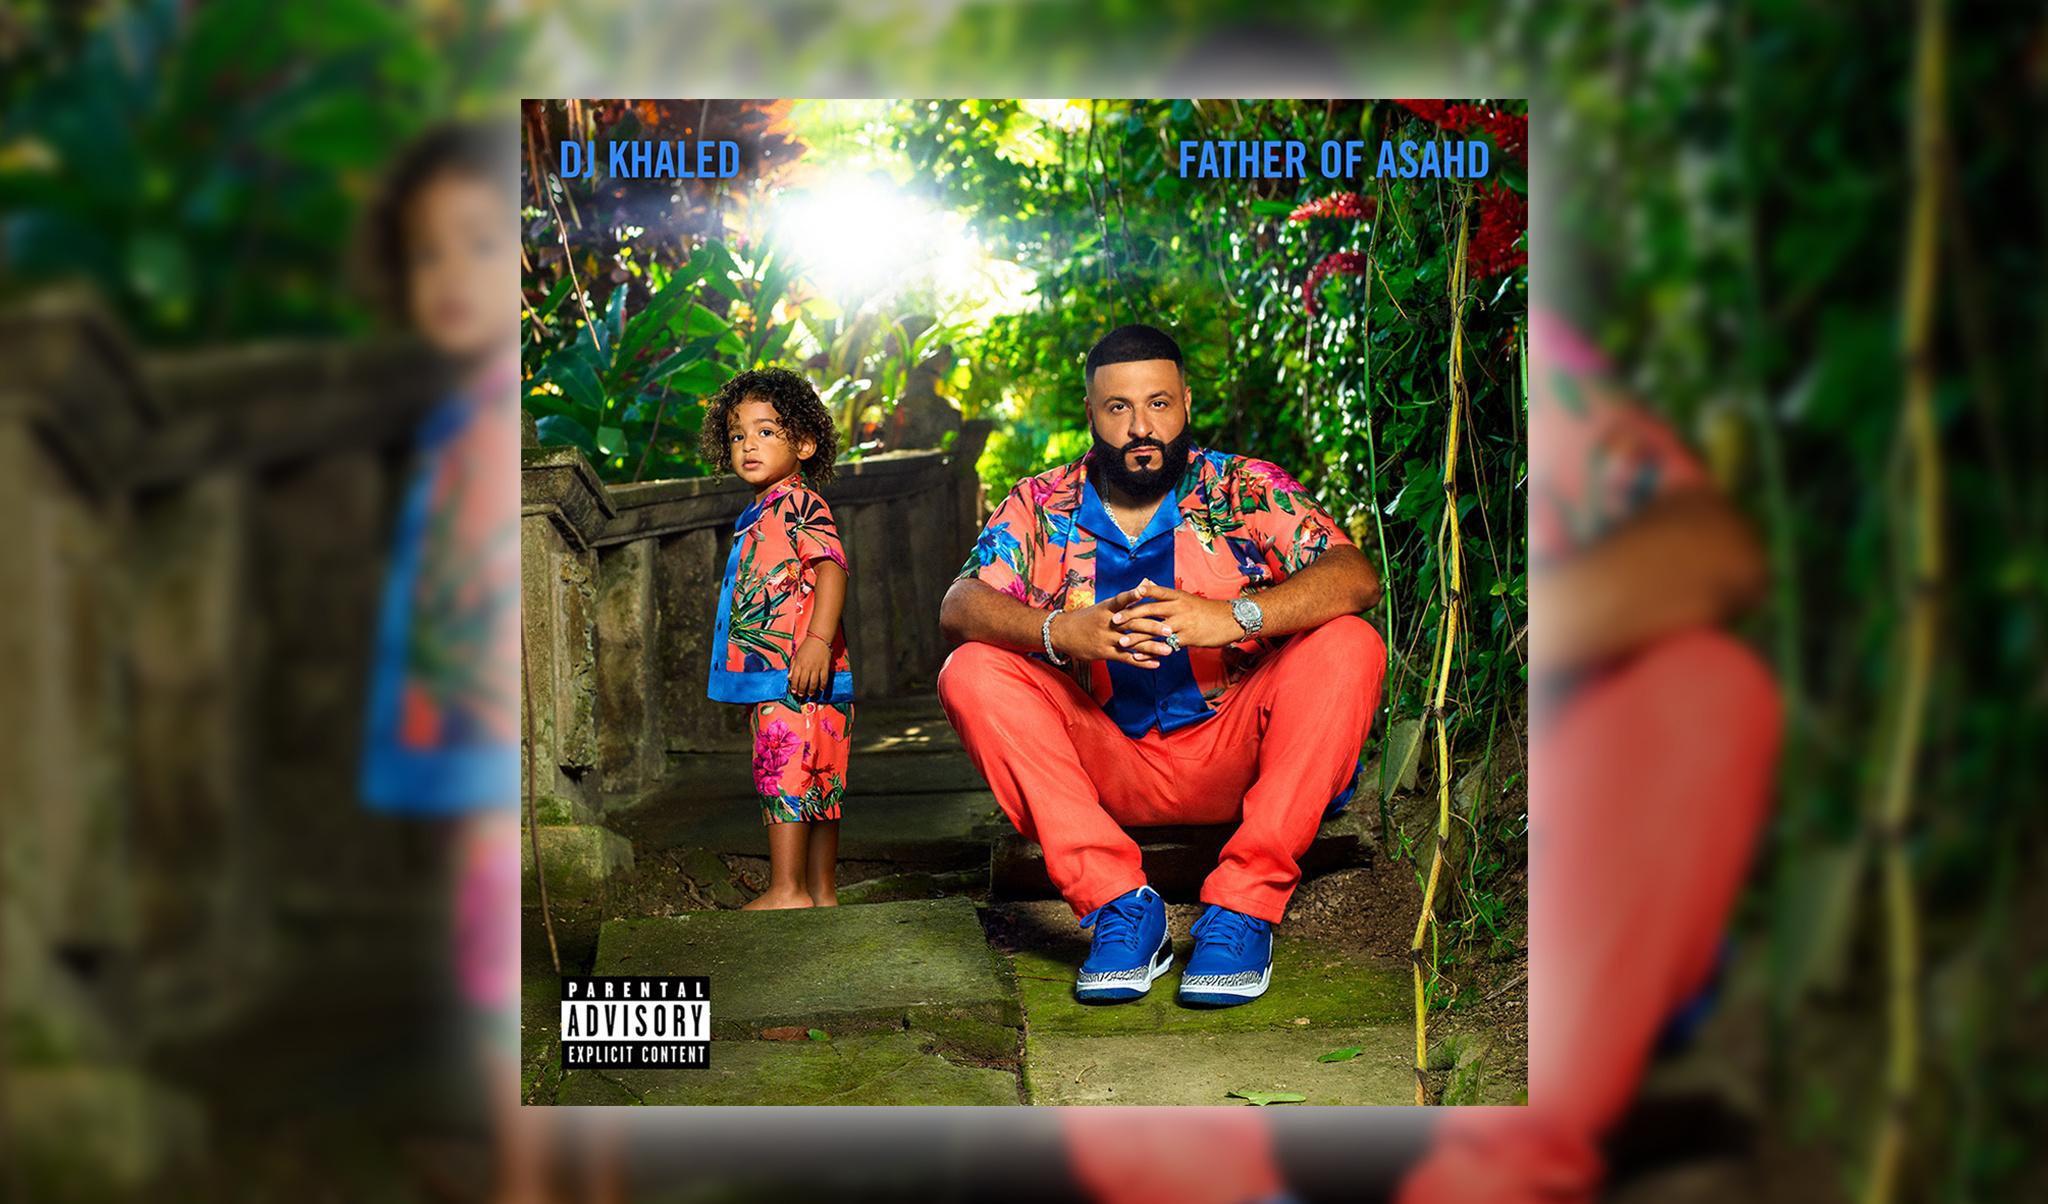 New Album: DJ Khaled - Father Of Asahd